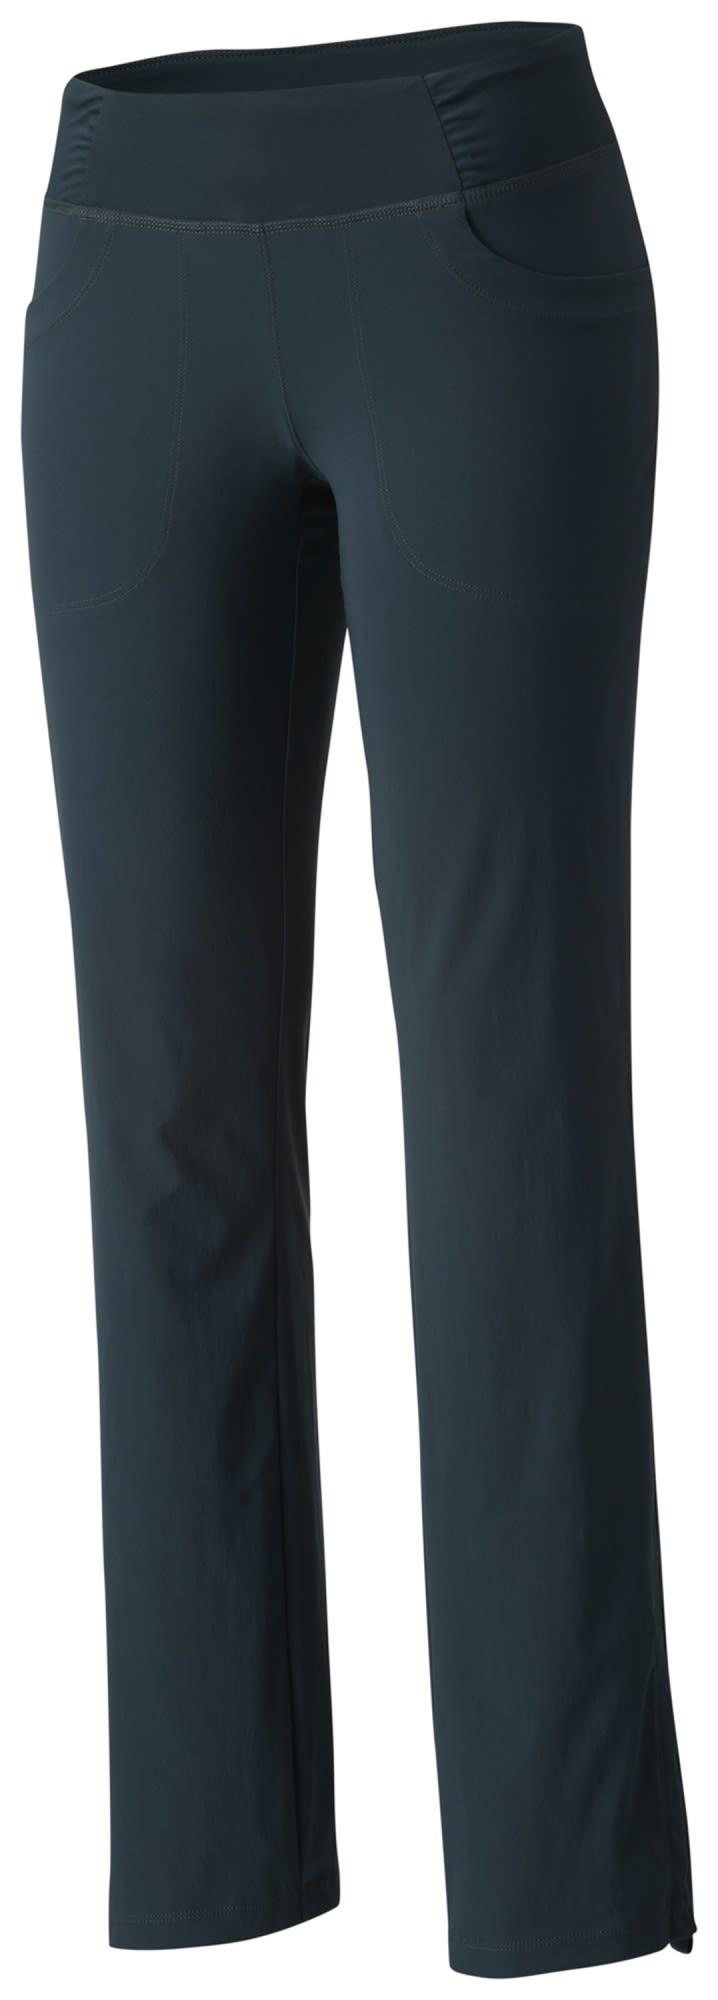 Mountain Hardwear Dynama Pant Blau, Female Hose, M